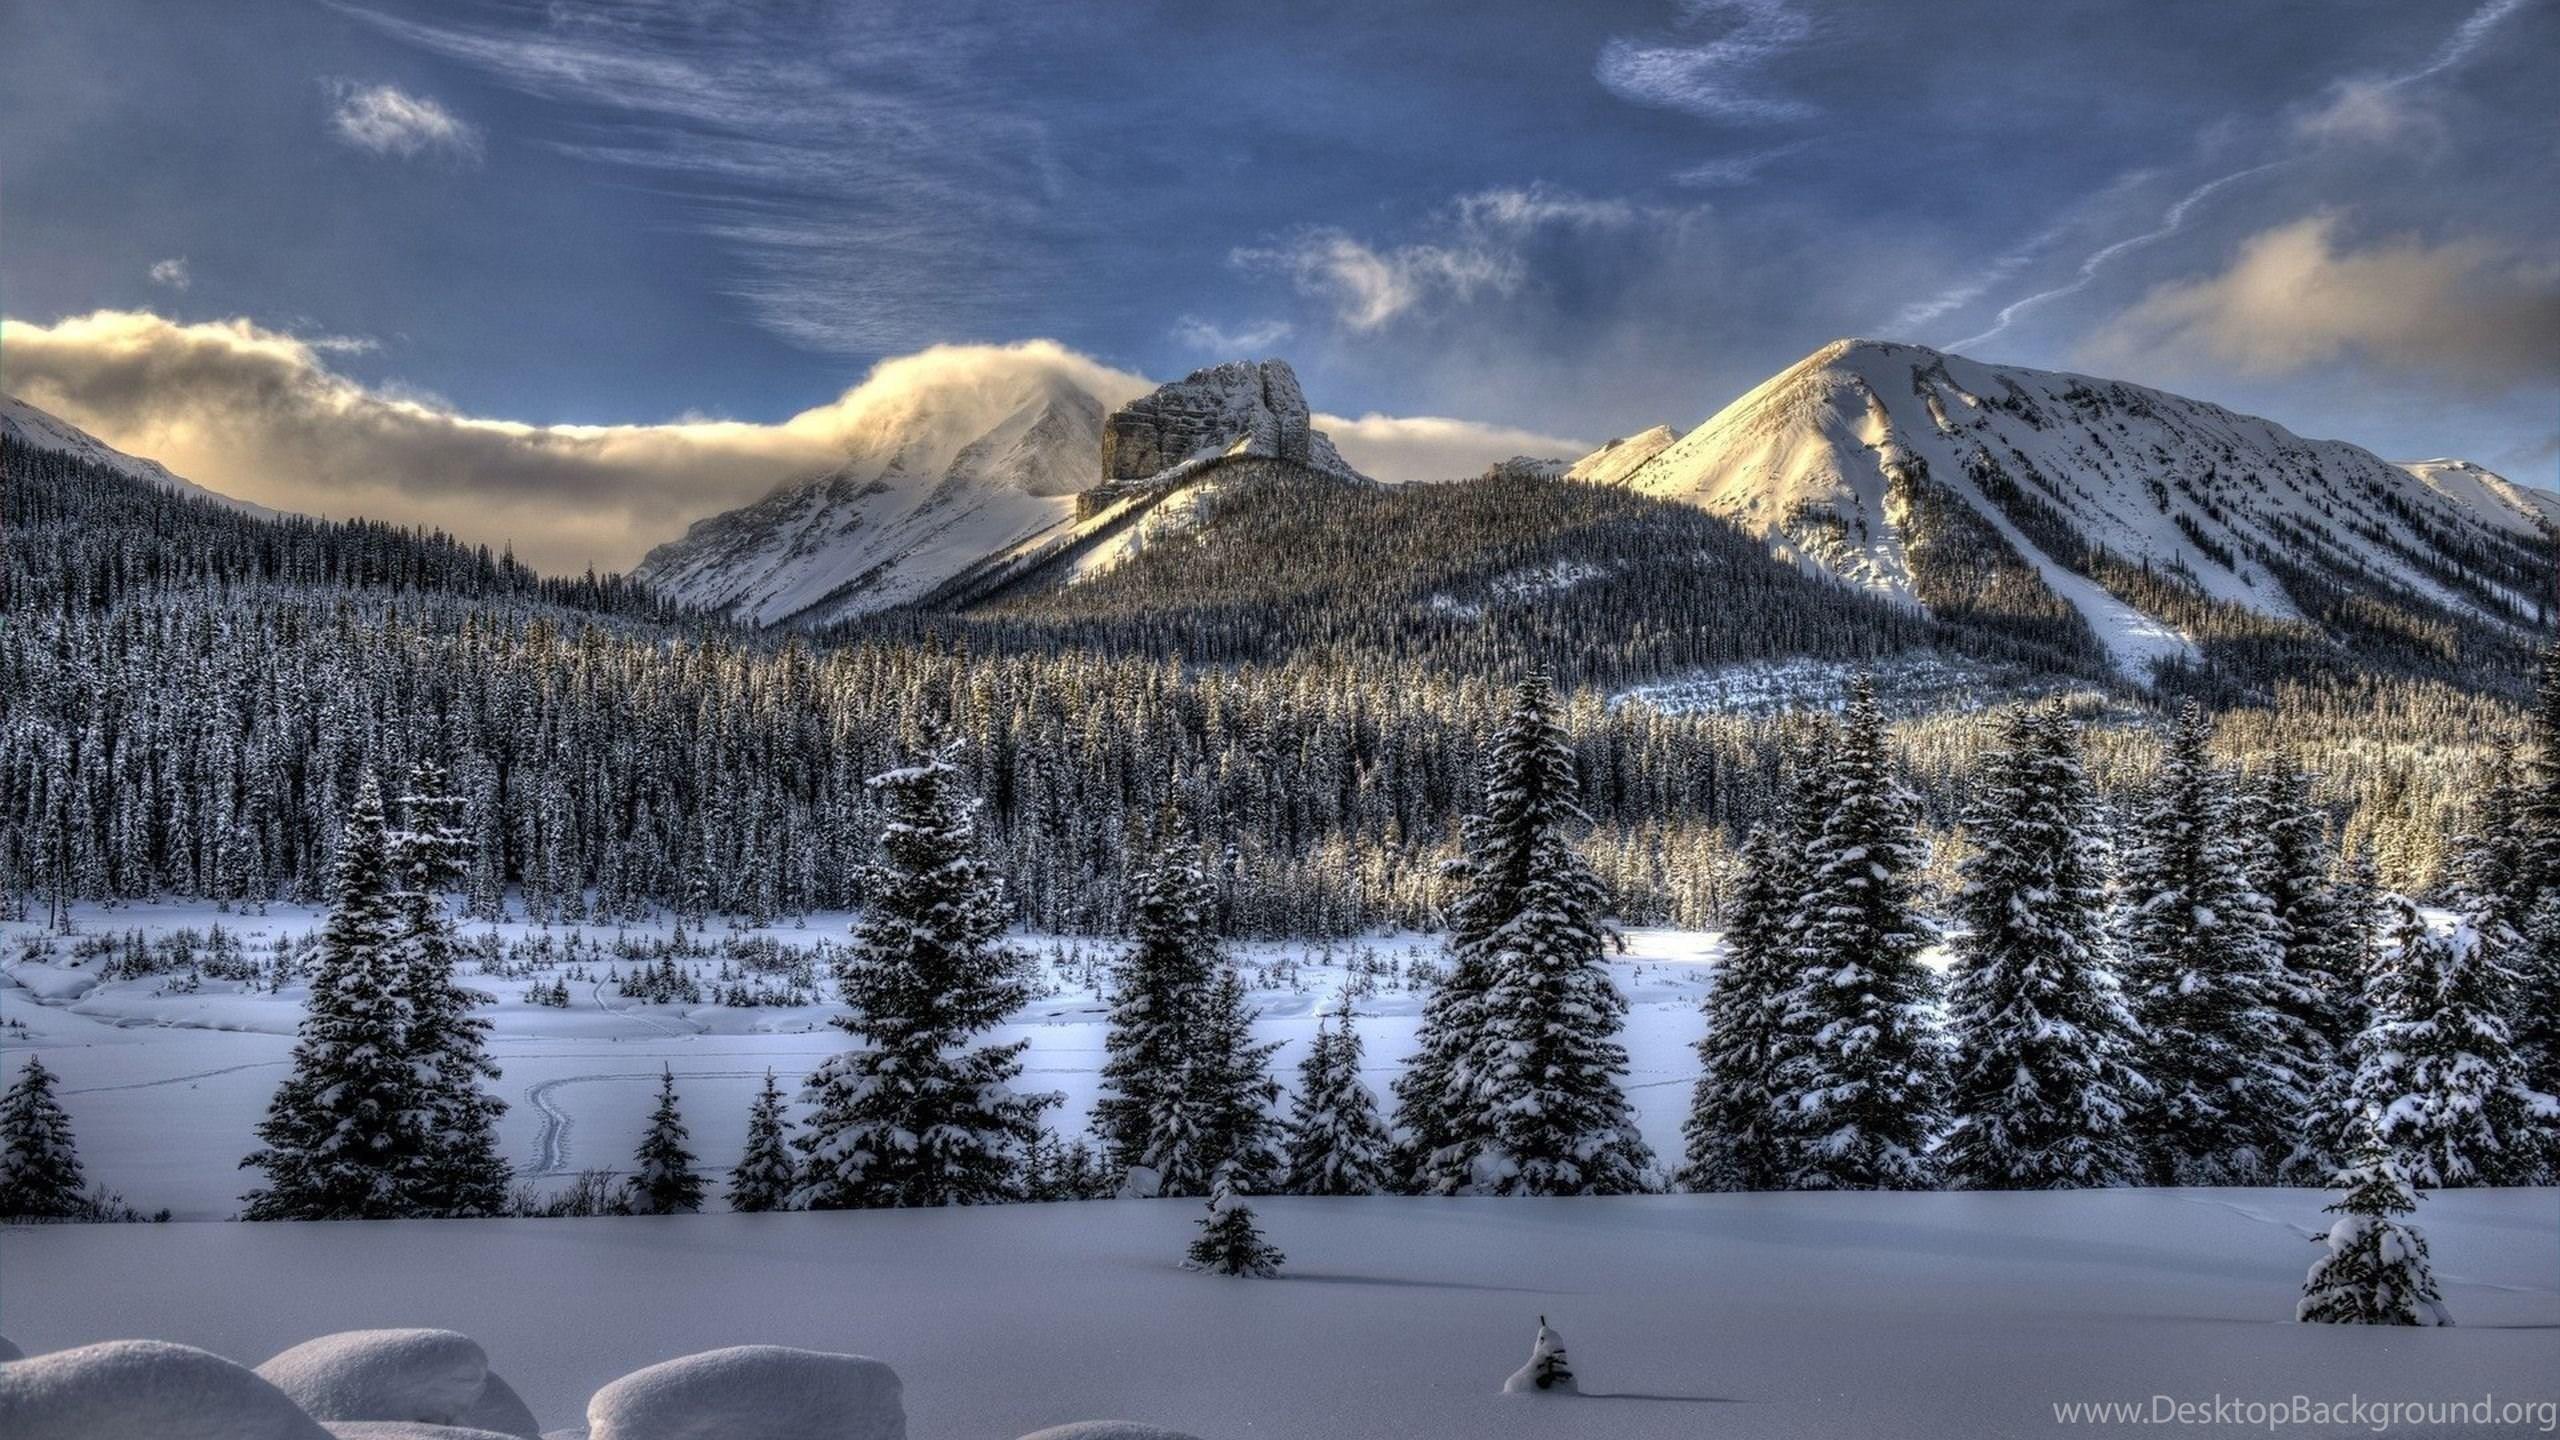 Download Wallpapers 2560x1440 Snow Winter Trees Mac Imac 27 Hd Desktop Background